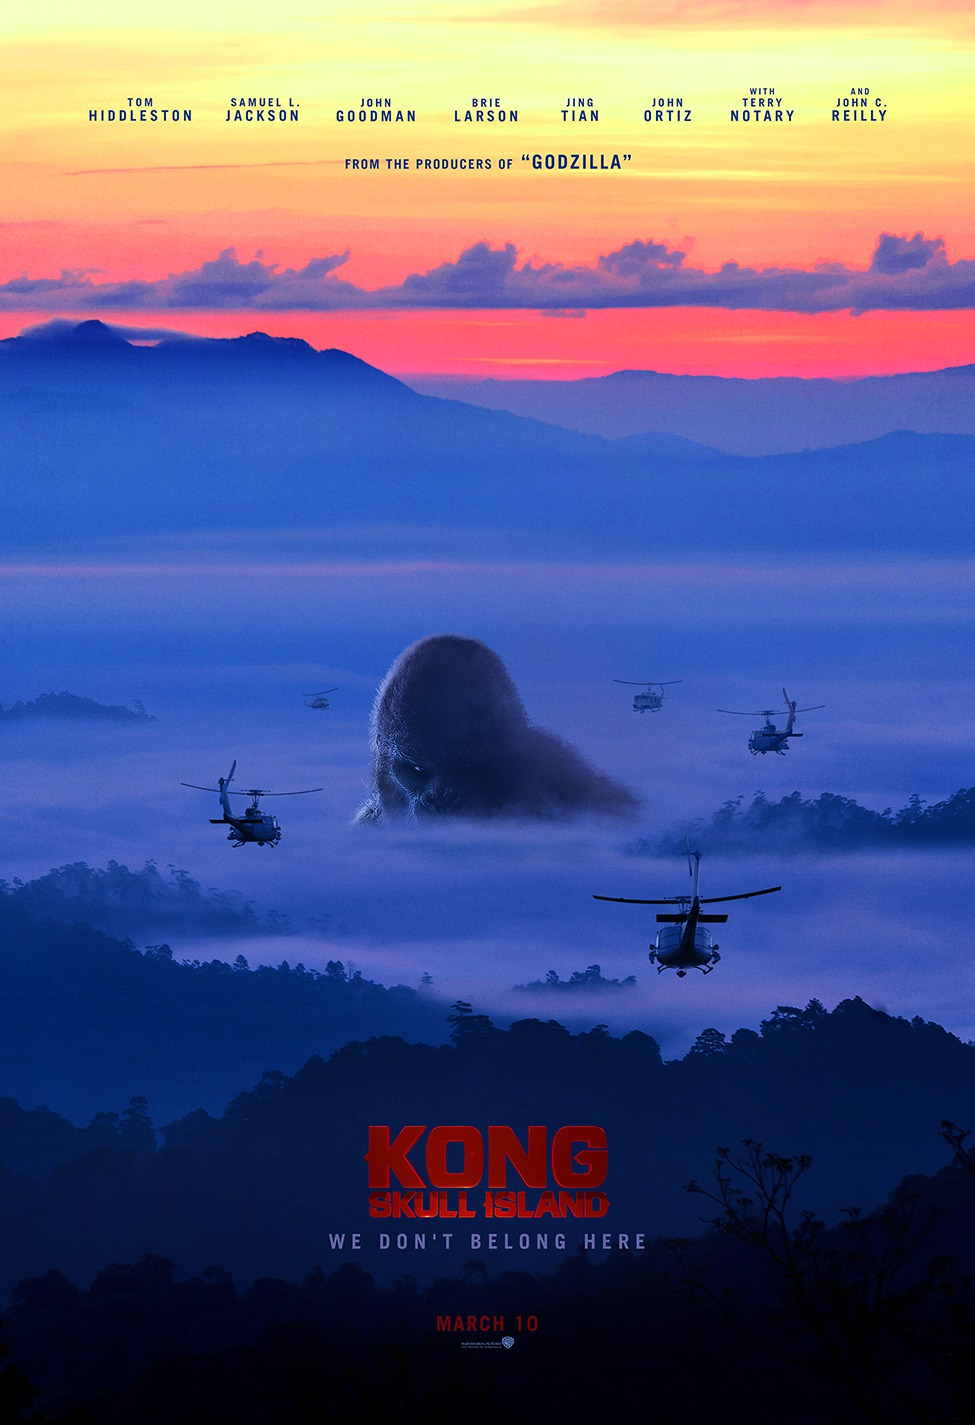 Kong Skull Island Full Movie Trailer